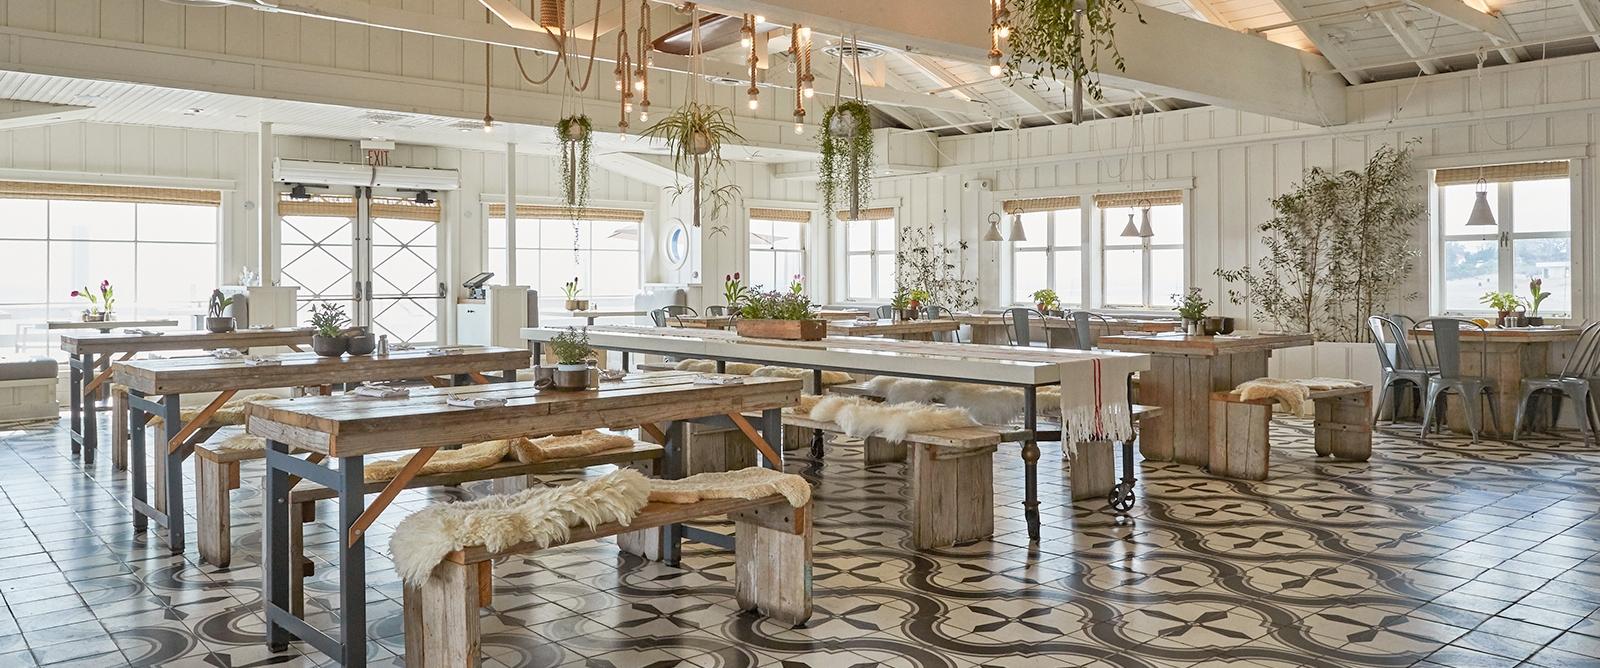 Malibu_Farm_restaurant_on_pier.jpg